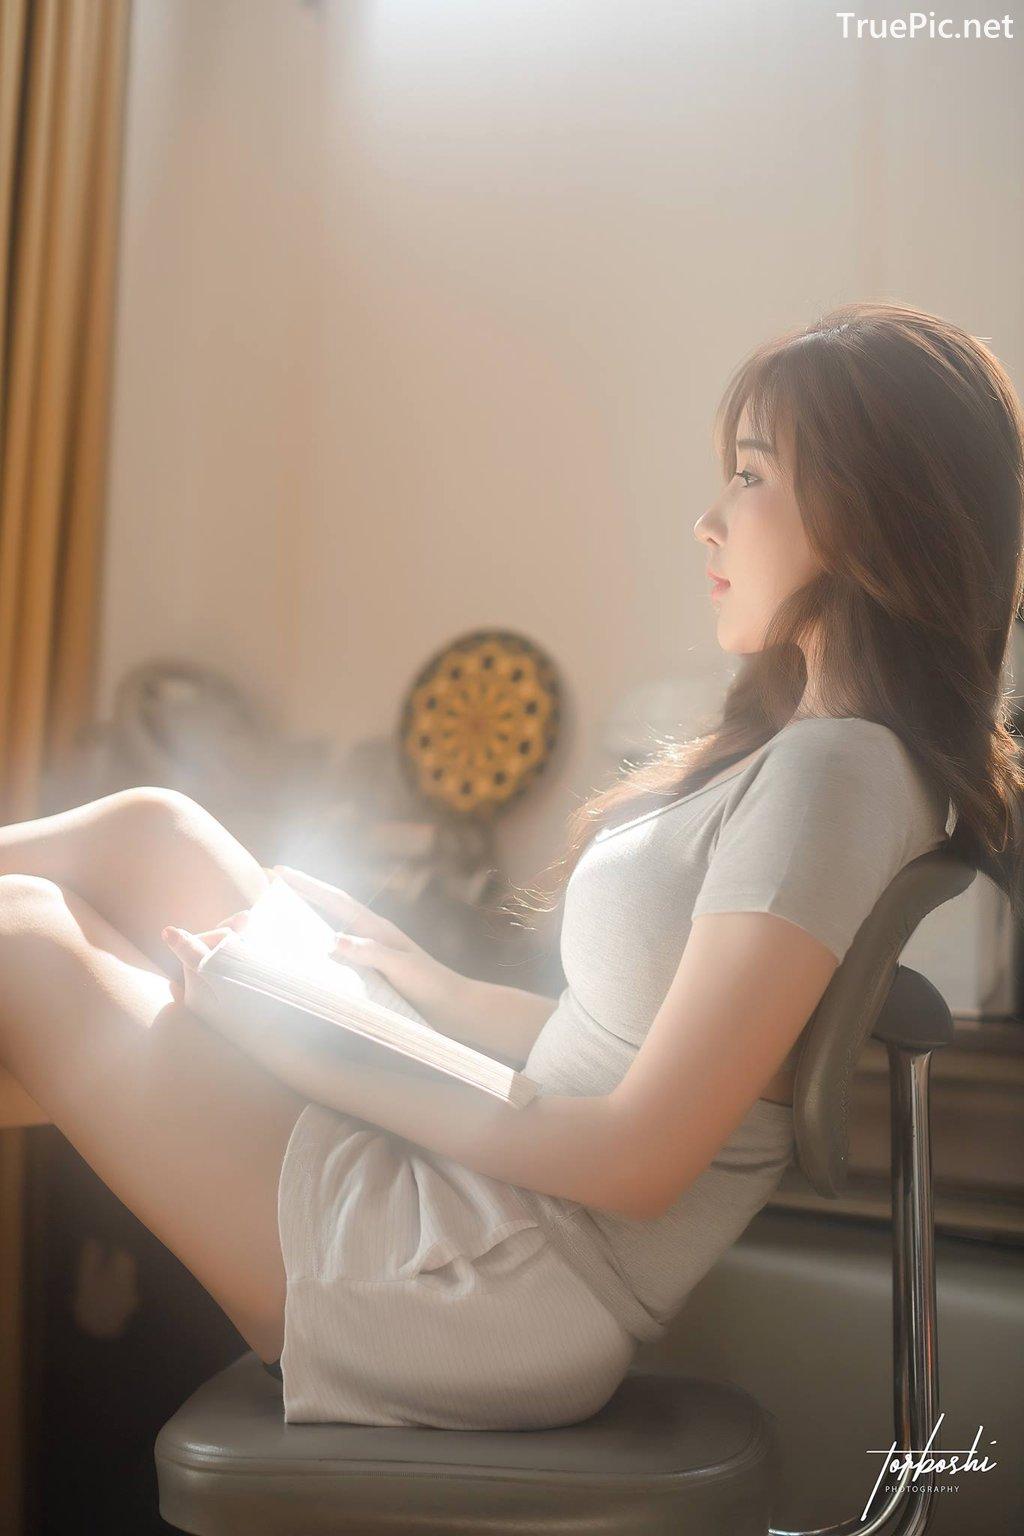 Image Thailand Model - Thanyarat Charoenpornkittada - A Girl Like You - TruePic.net - Picture-1